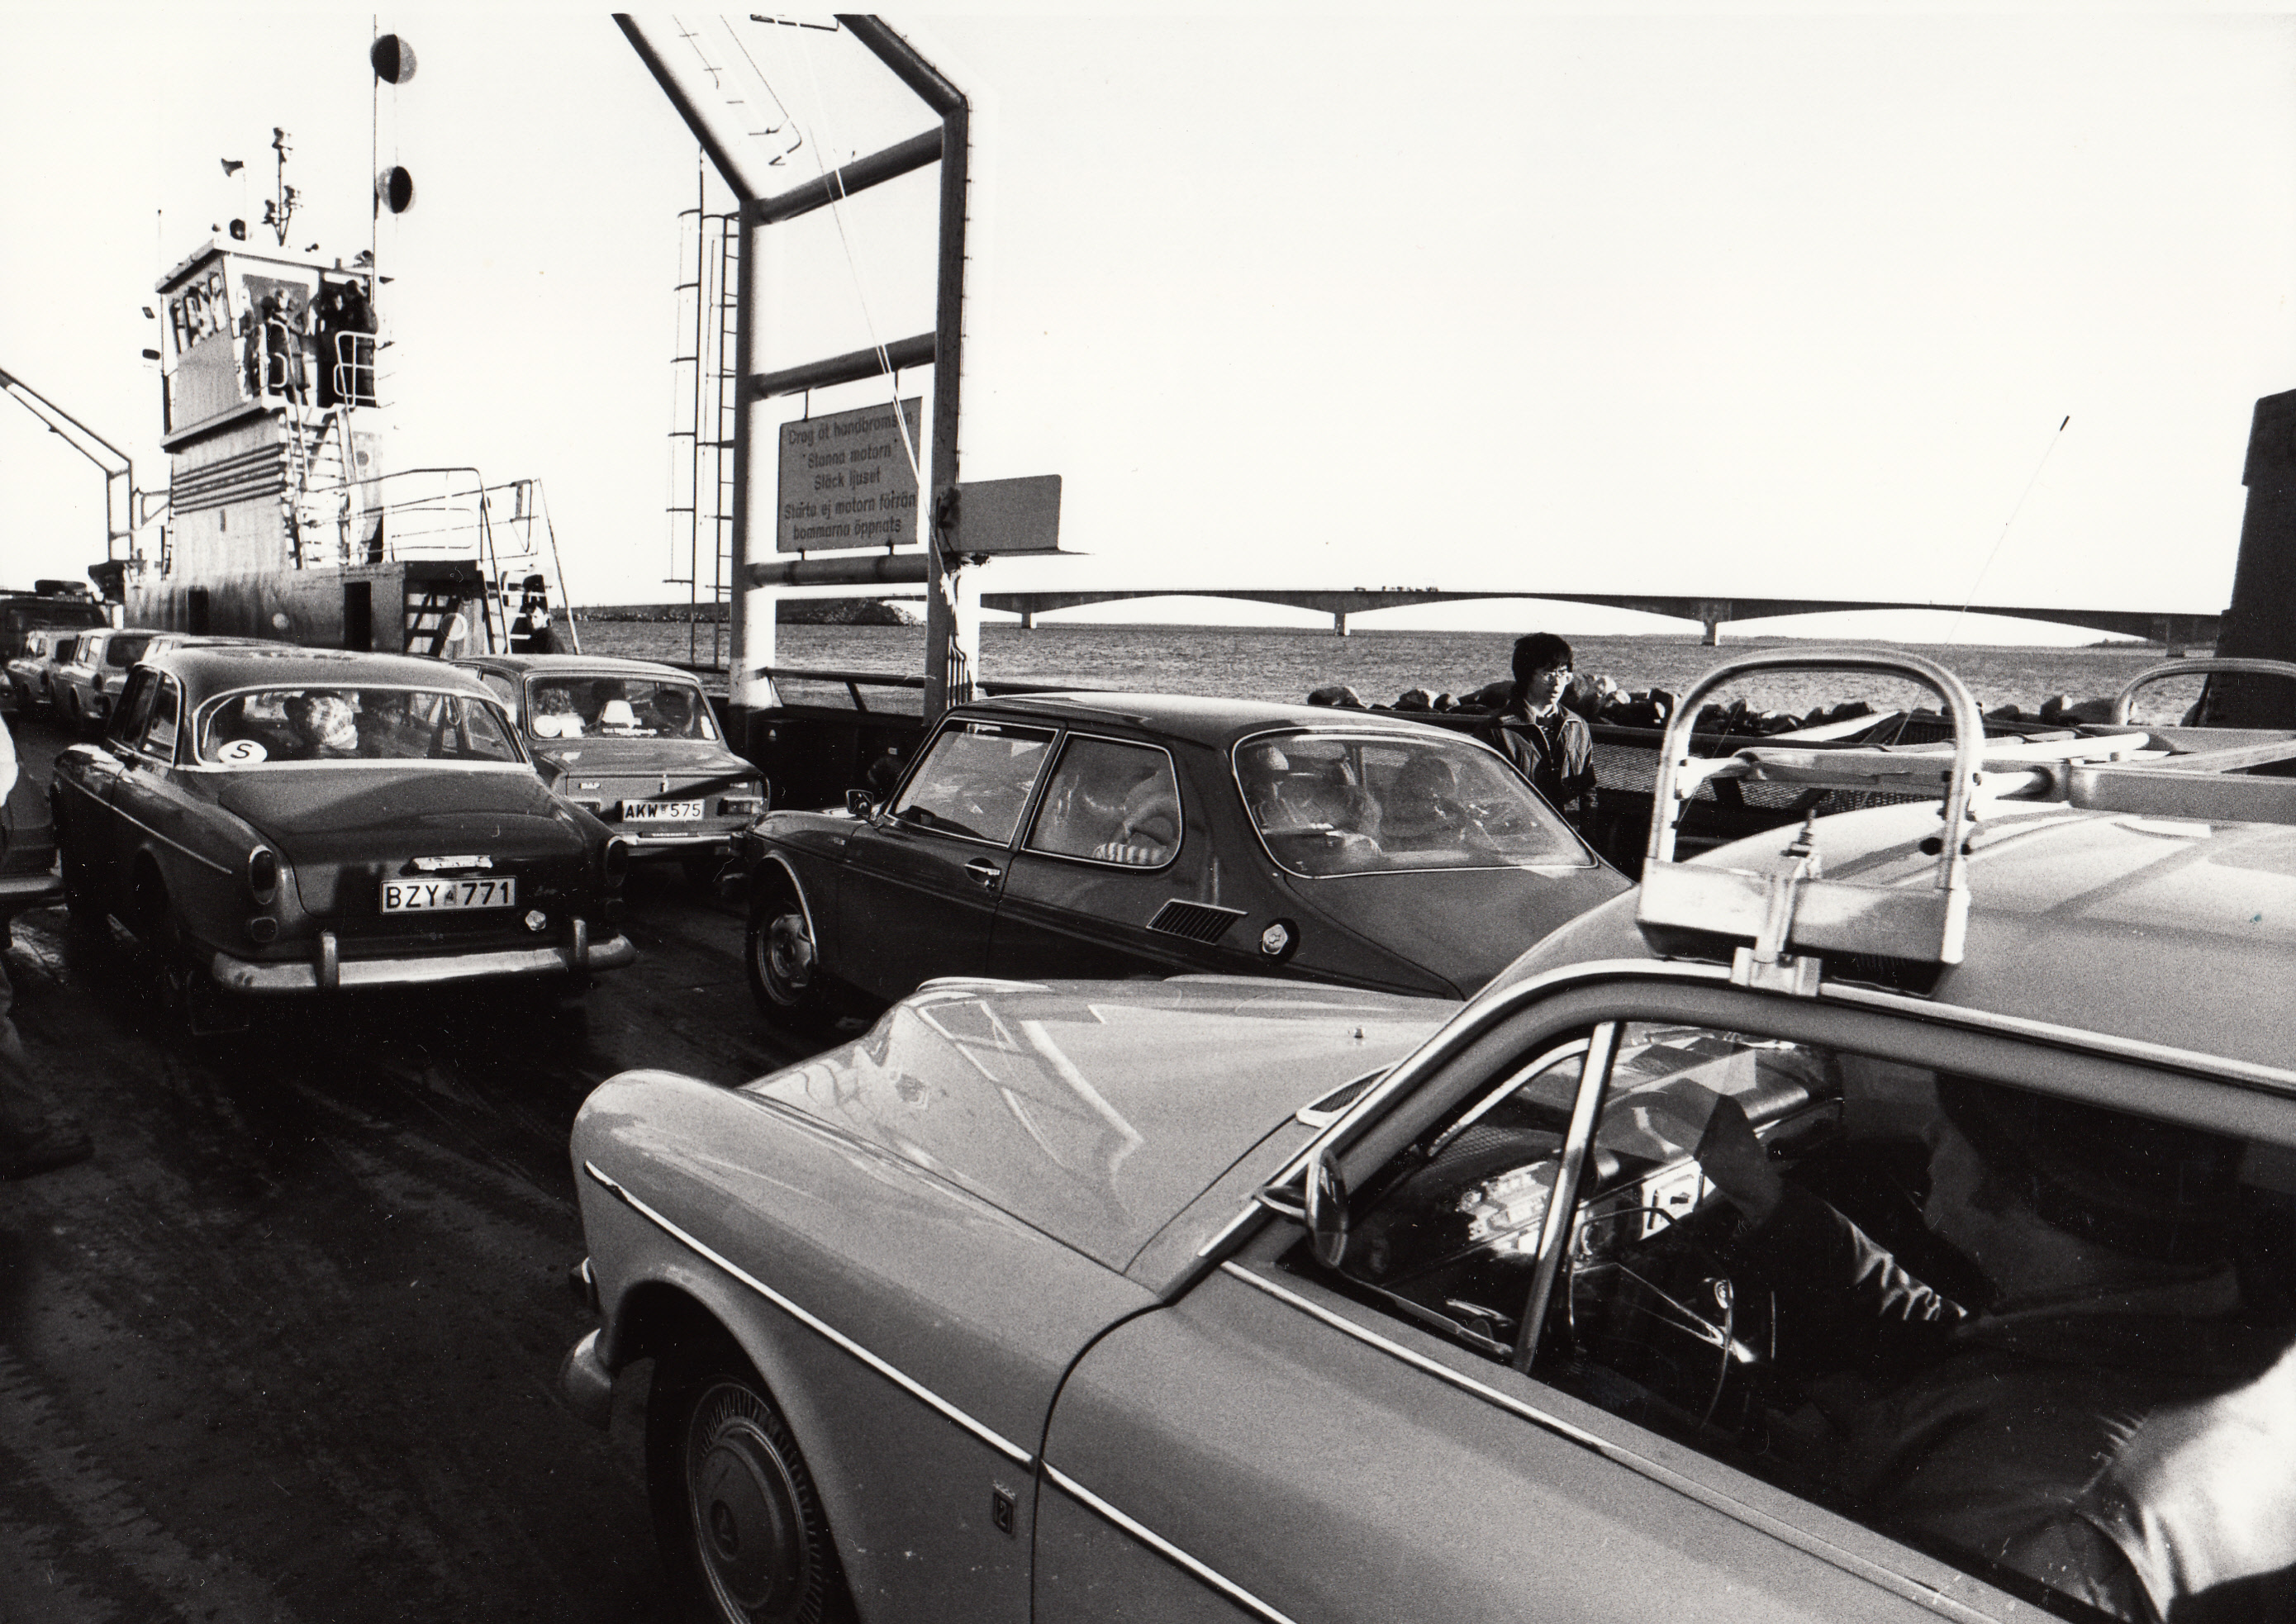 1978-10-28 Färjan gör sin sista tur.